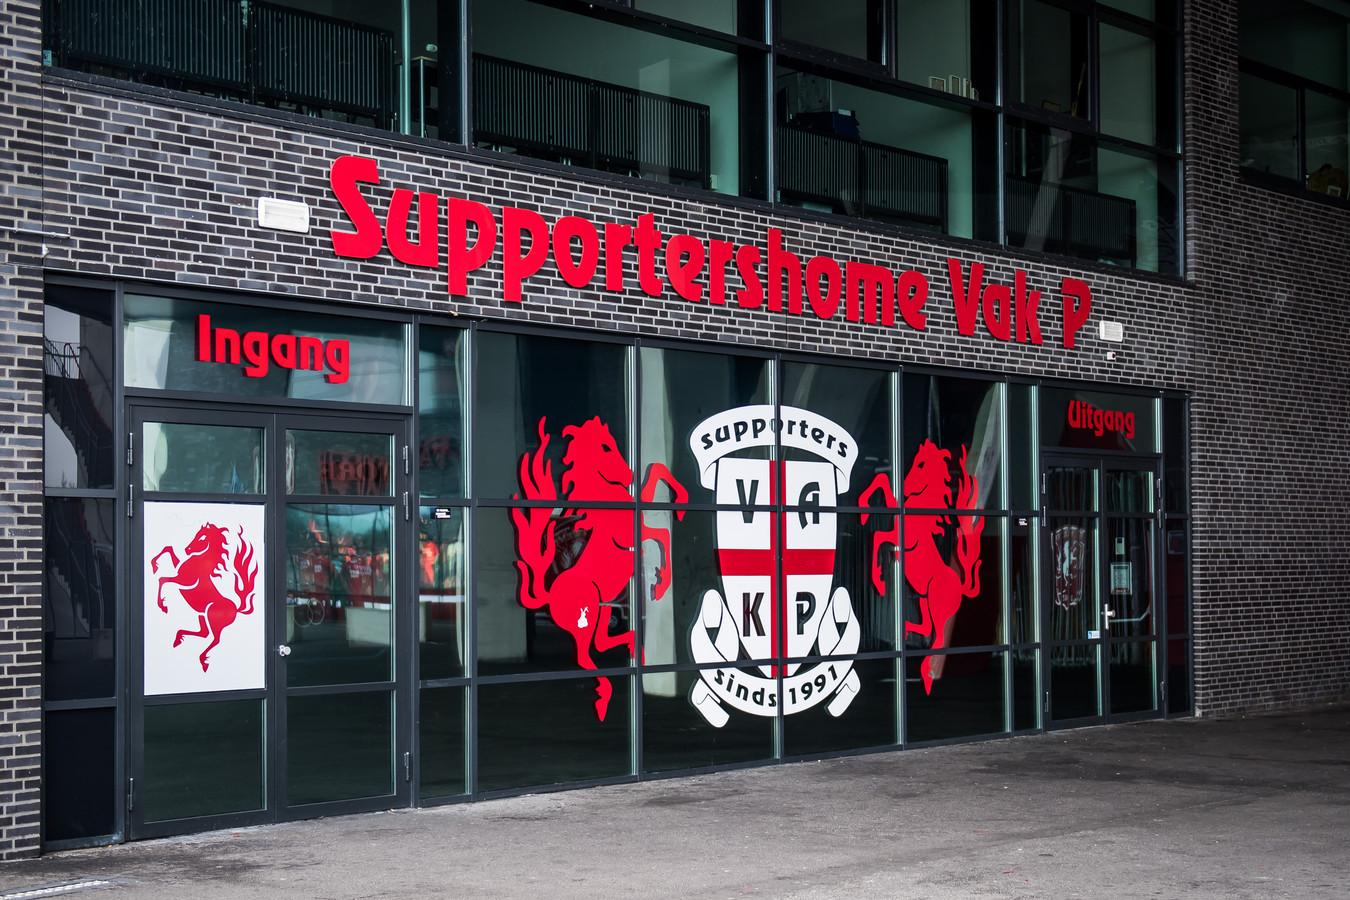 Supportershome Vak-P.